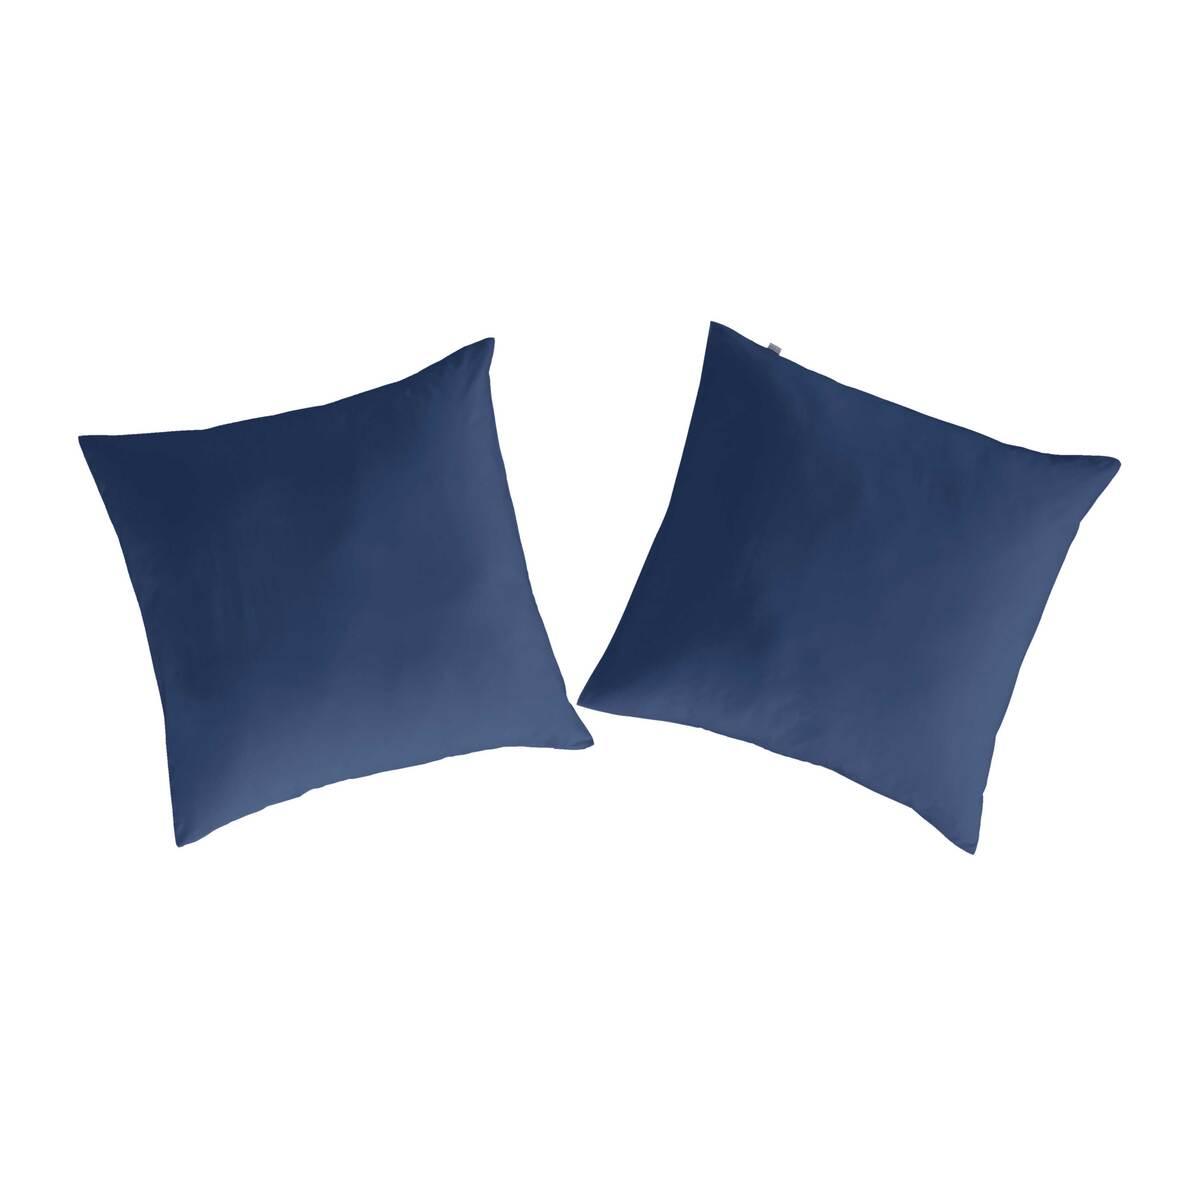 2 taies d'oreiller en coton bleu marine 65x65